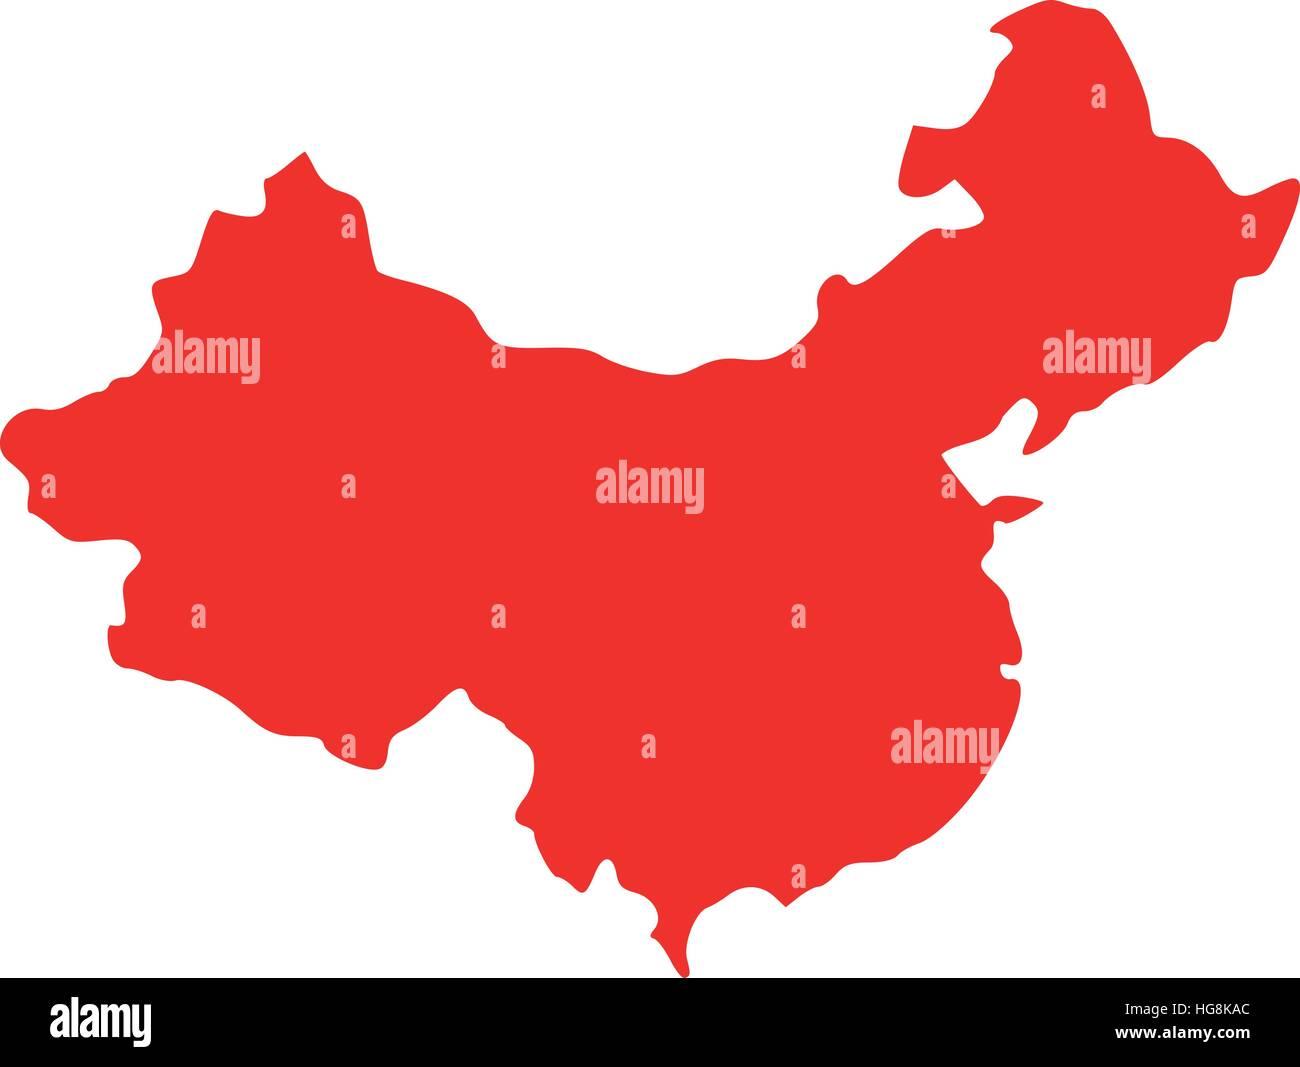 China map - Stock Image